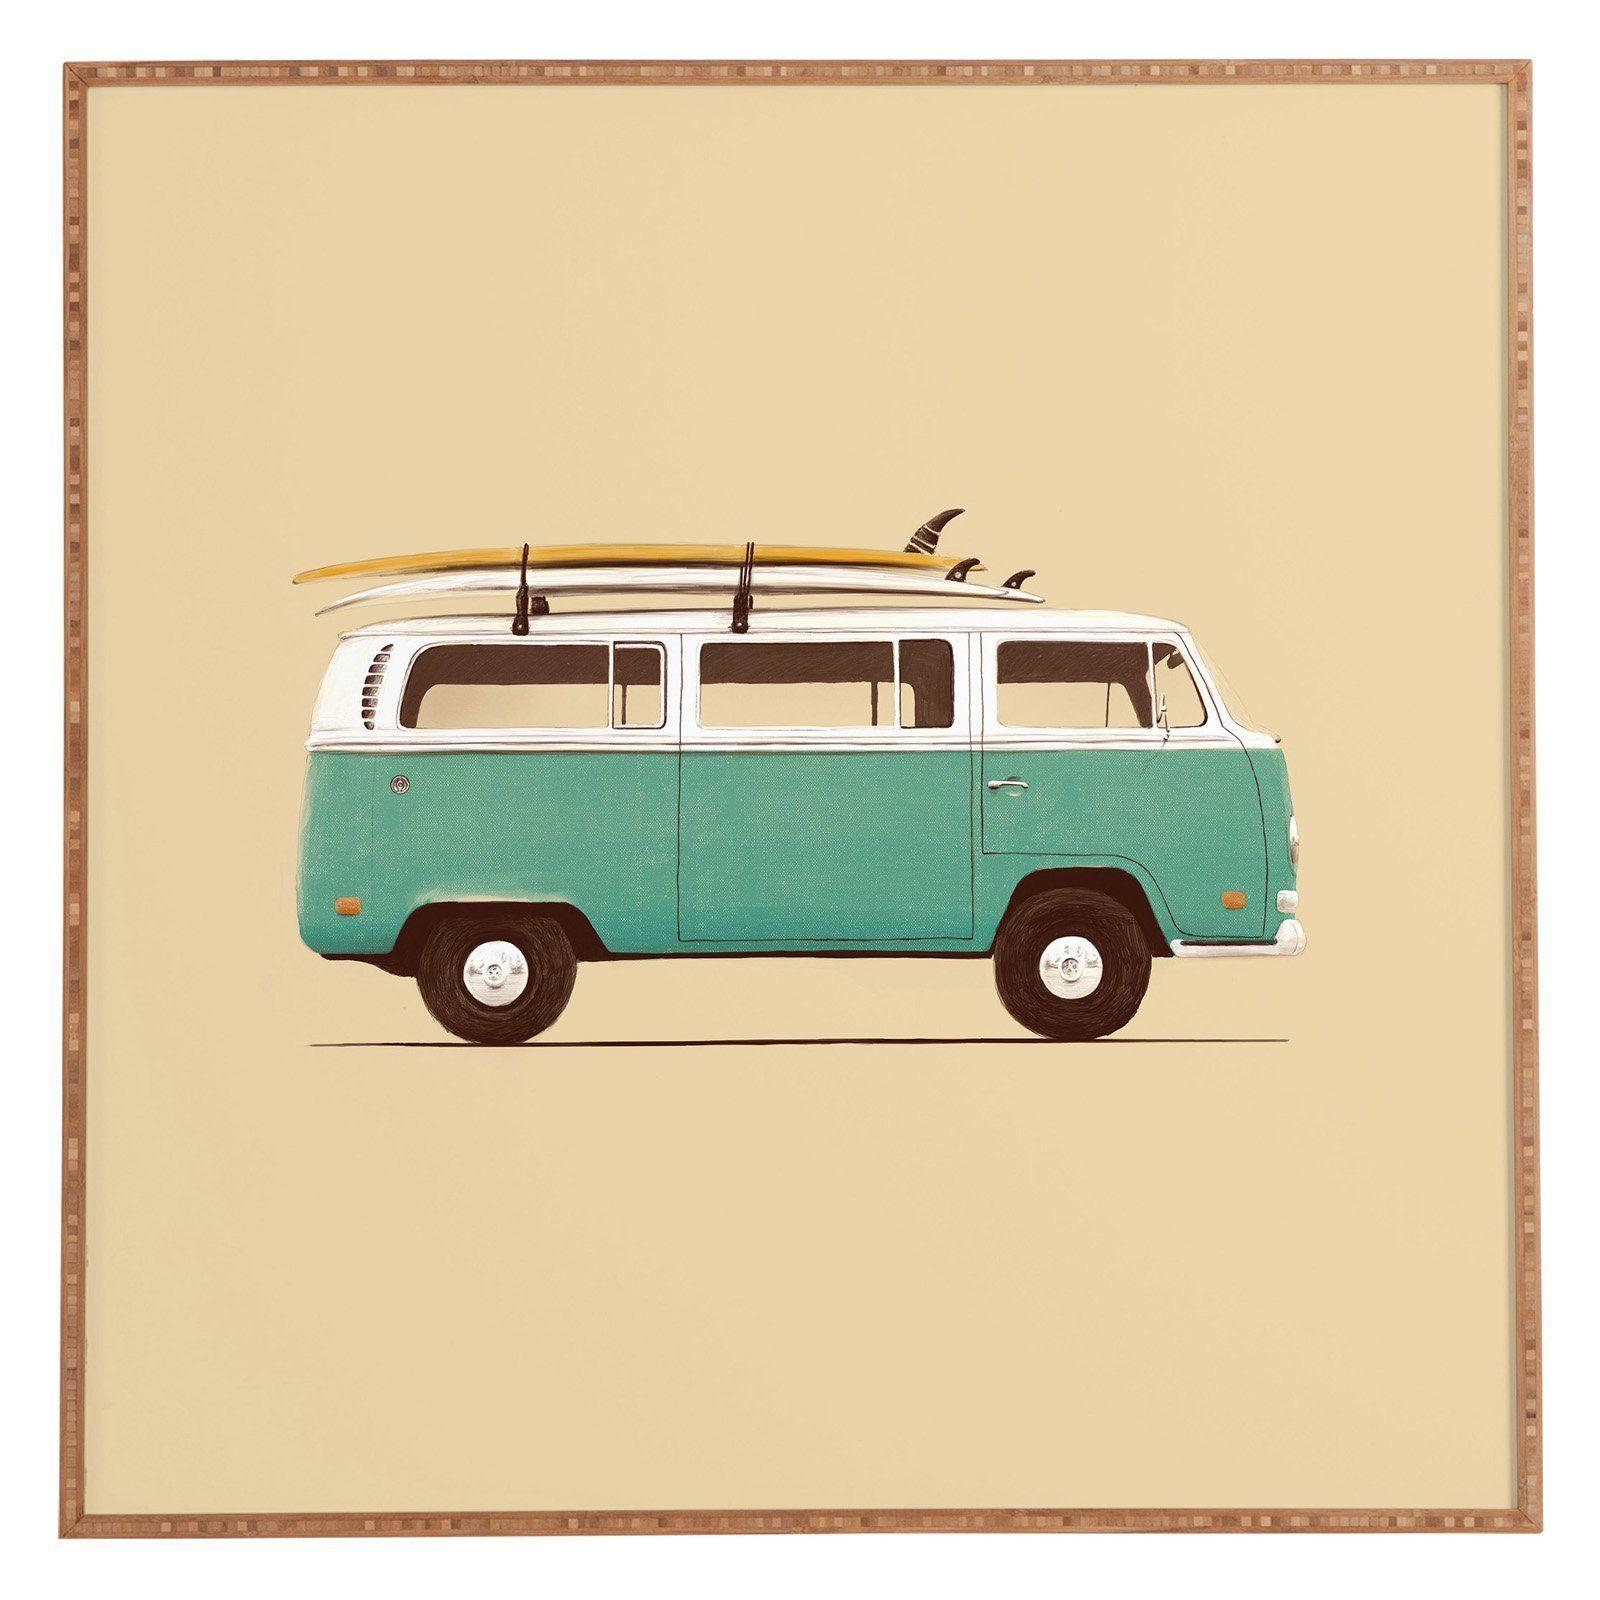 Deny Designs Florent Bodart Famous Cars 5 Blue Van Framed Wall Art ...